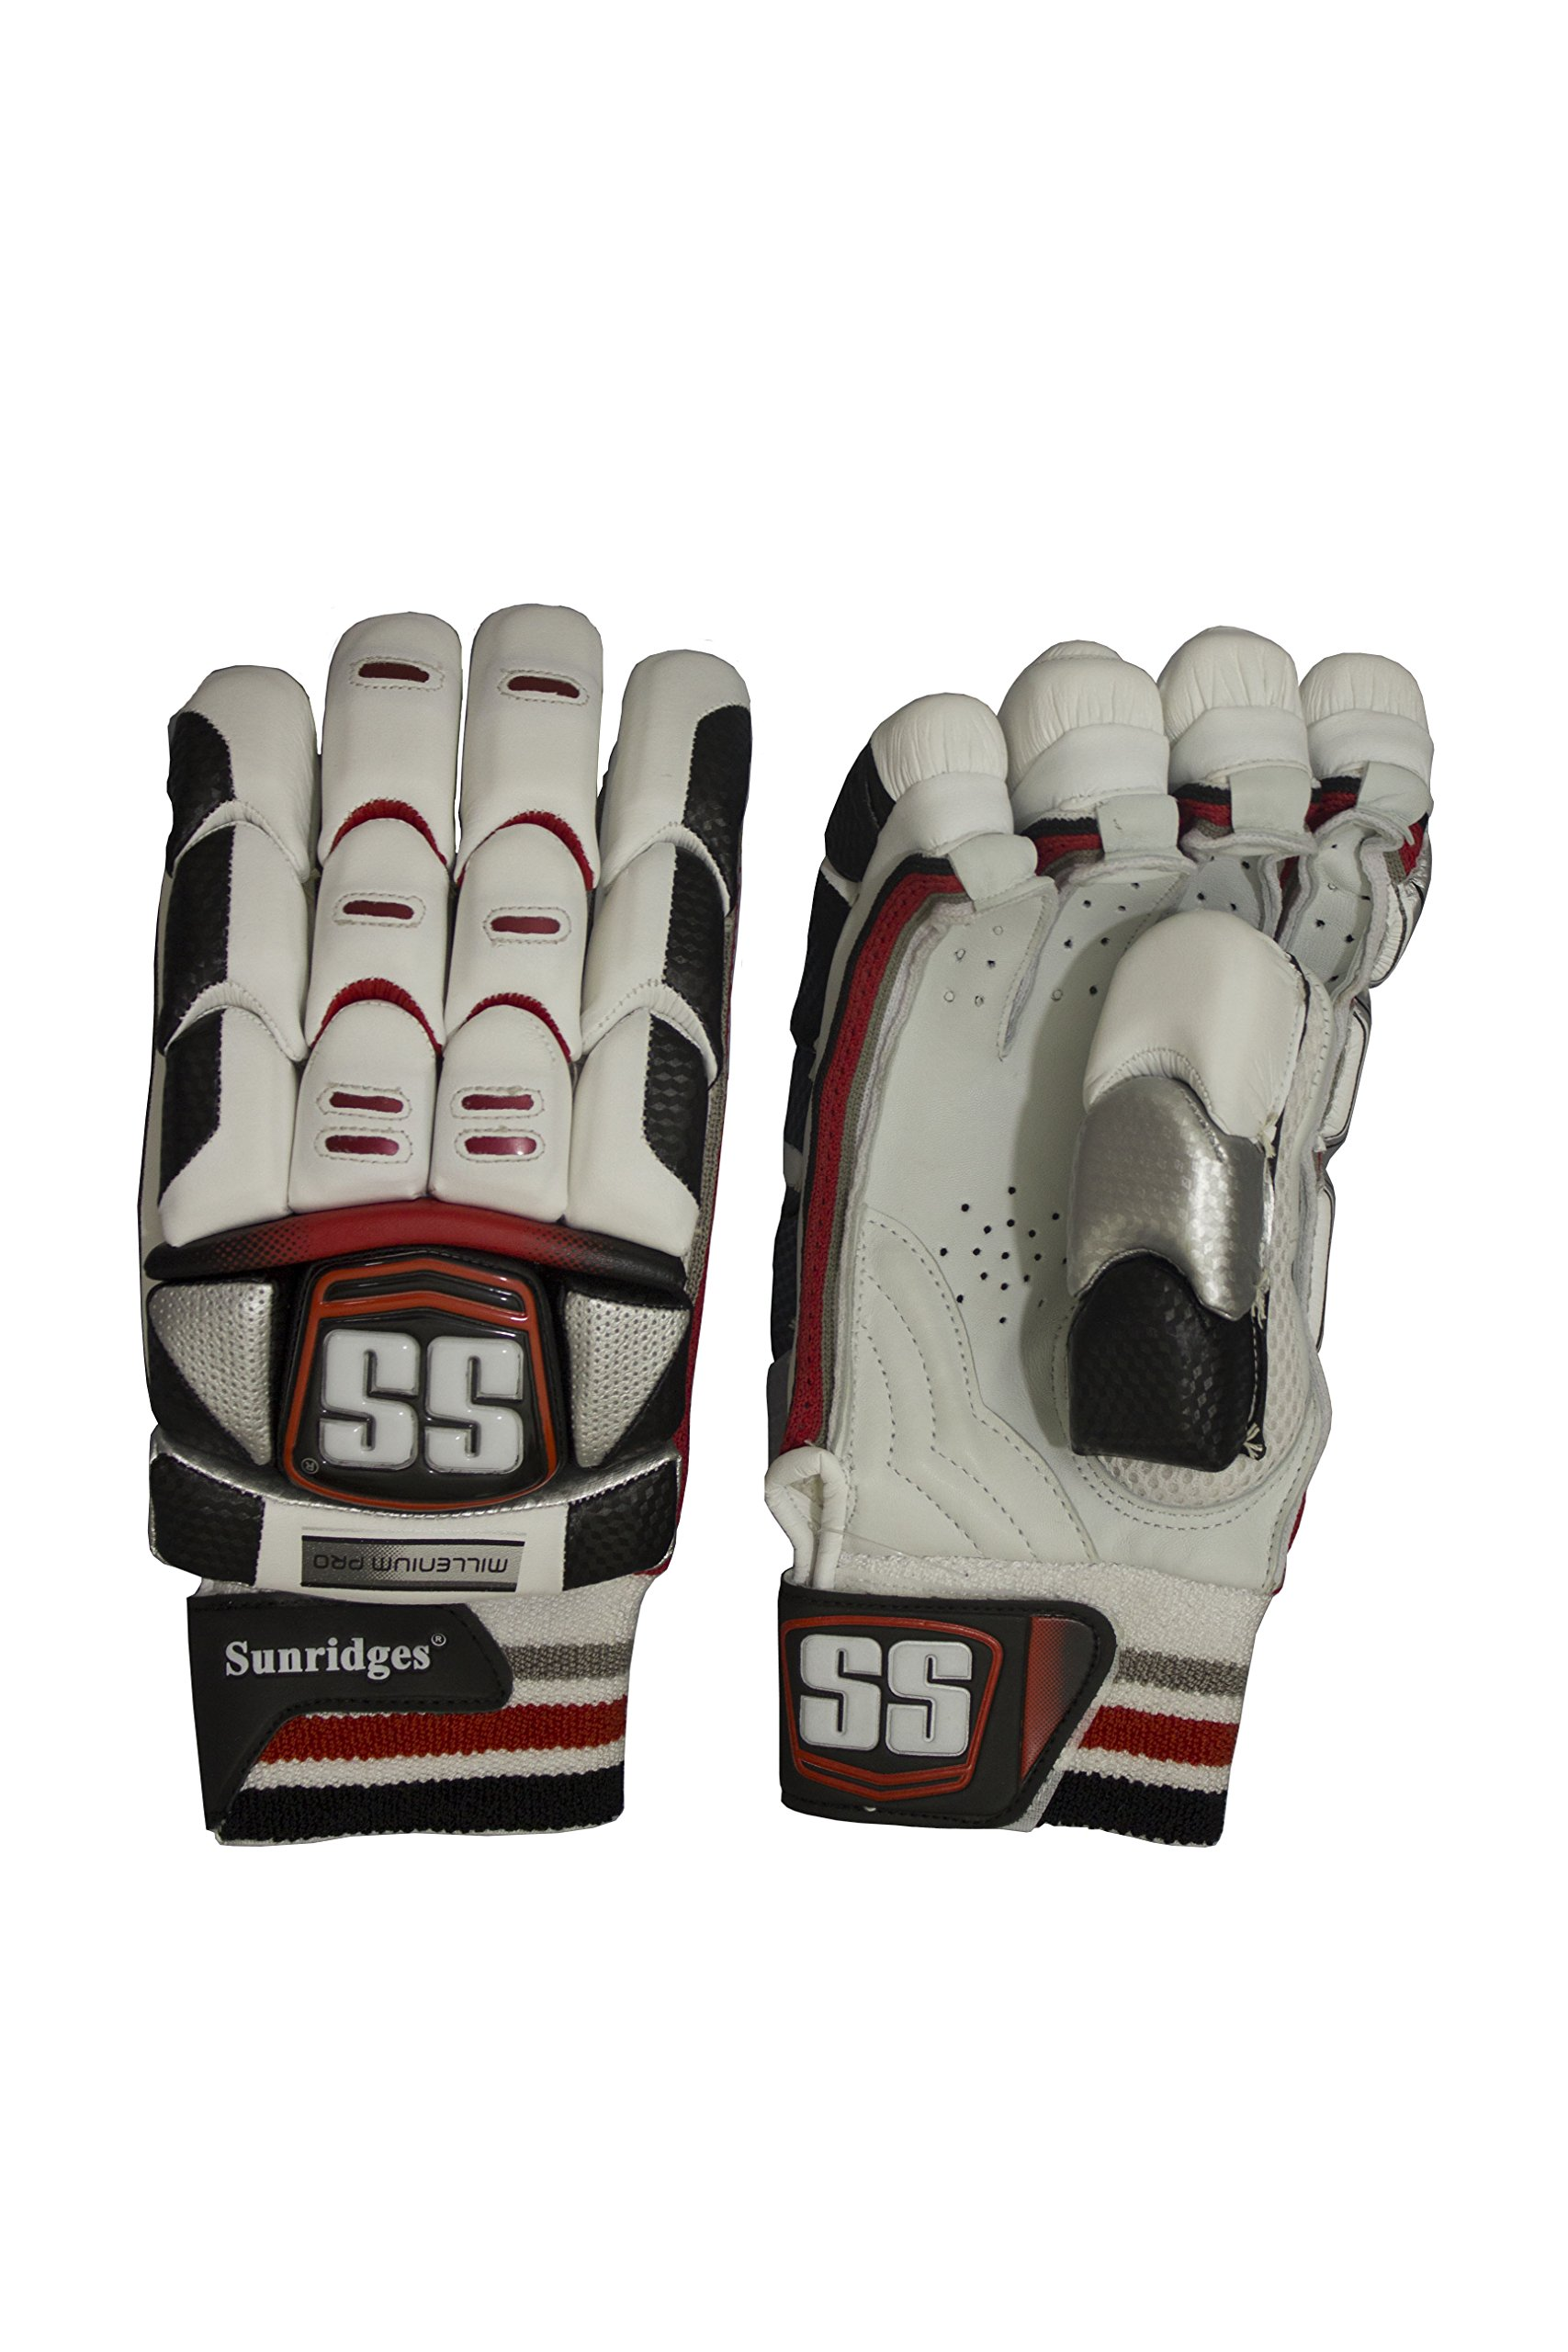 SS Millenium Pro Batting Gloves, Left Men's